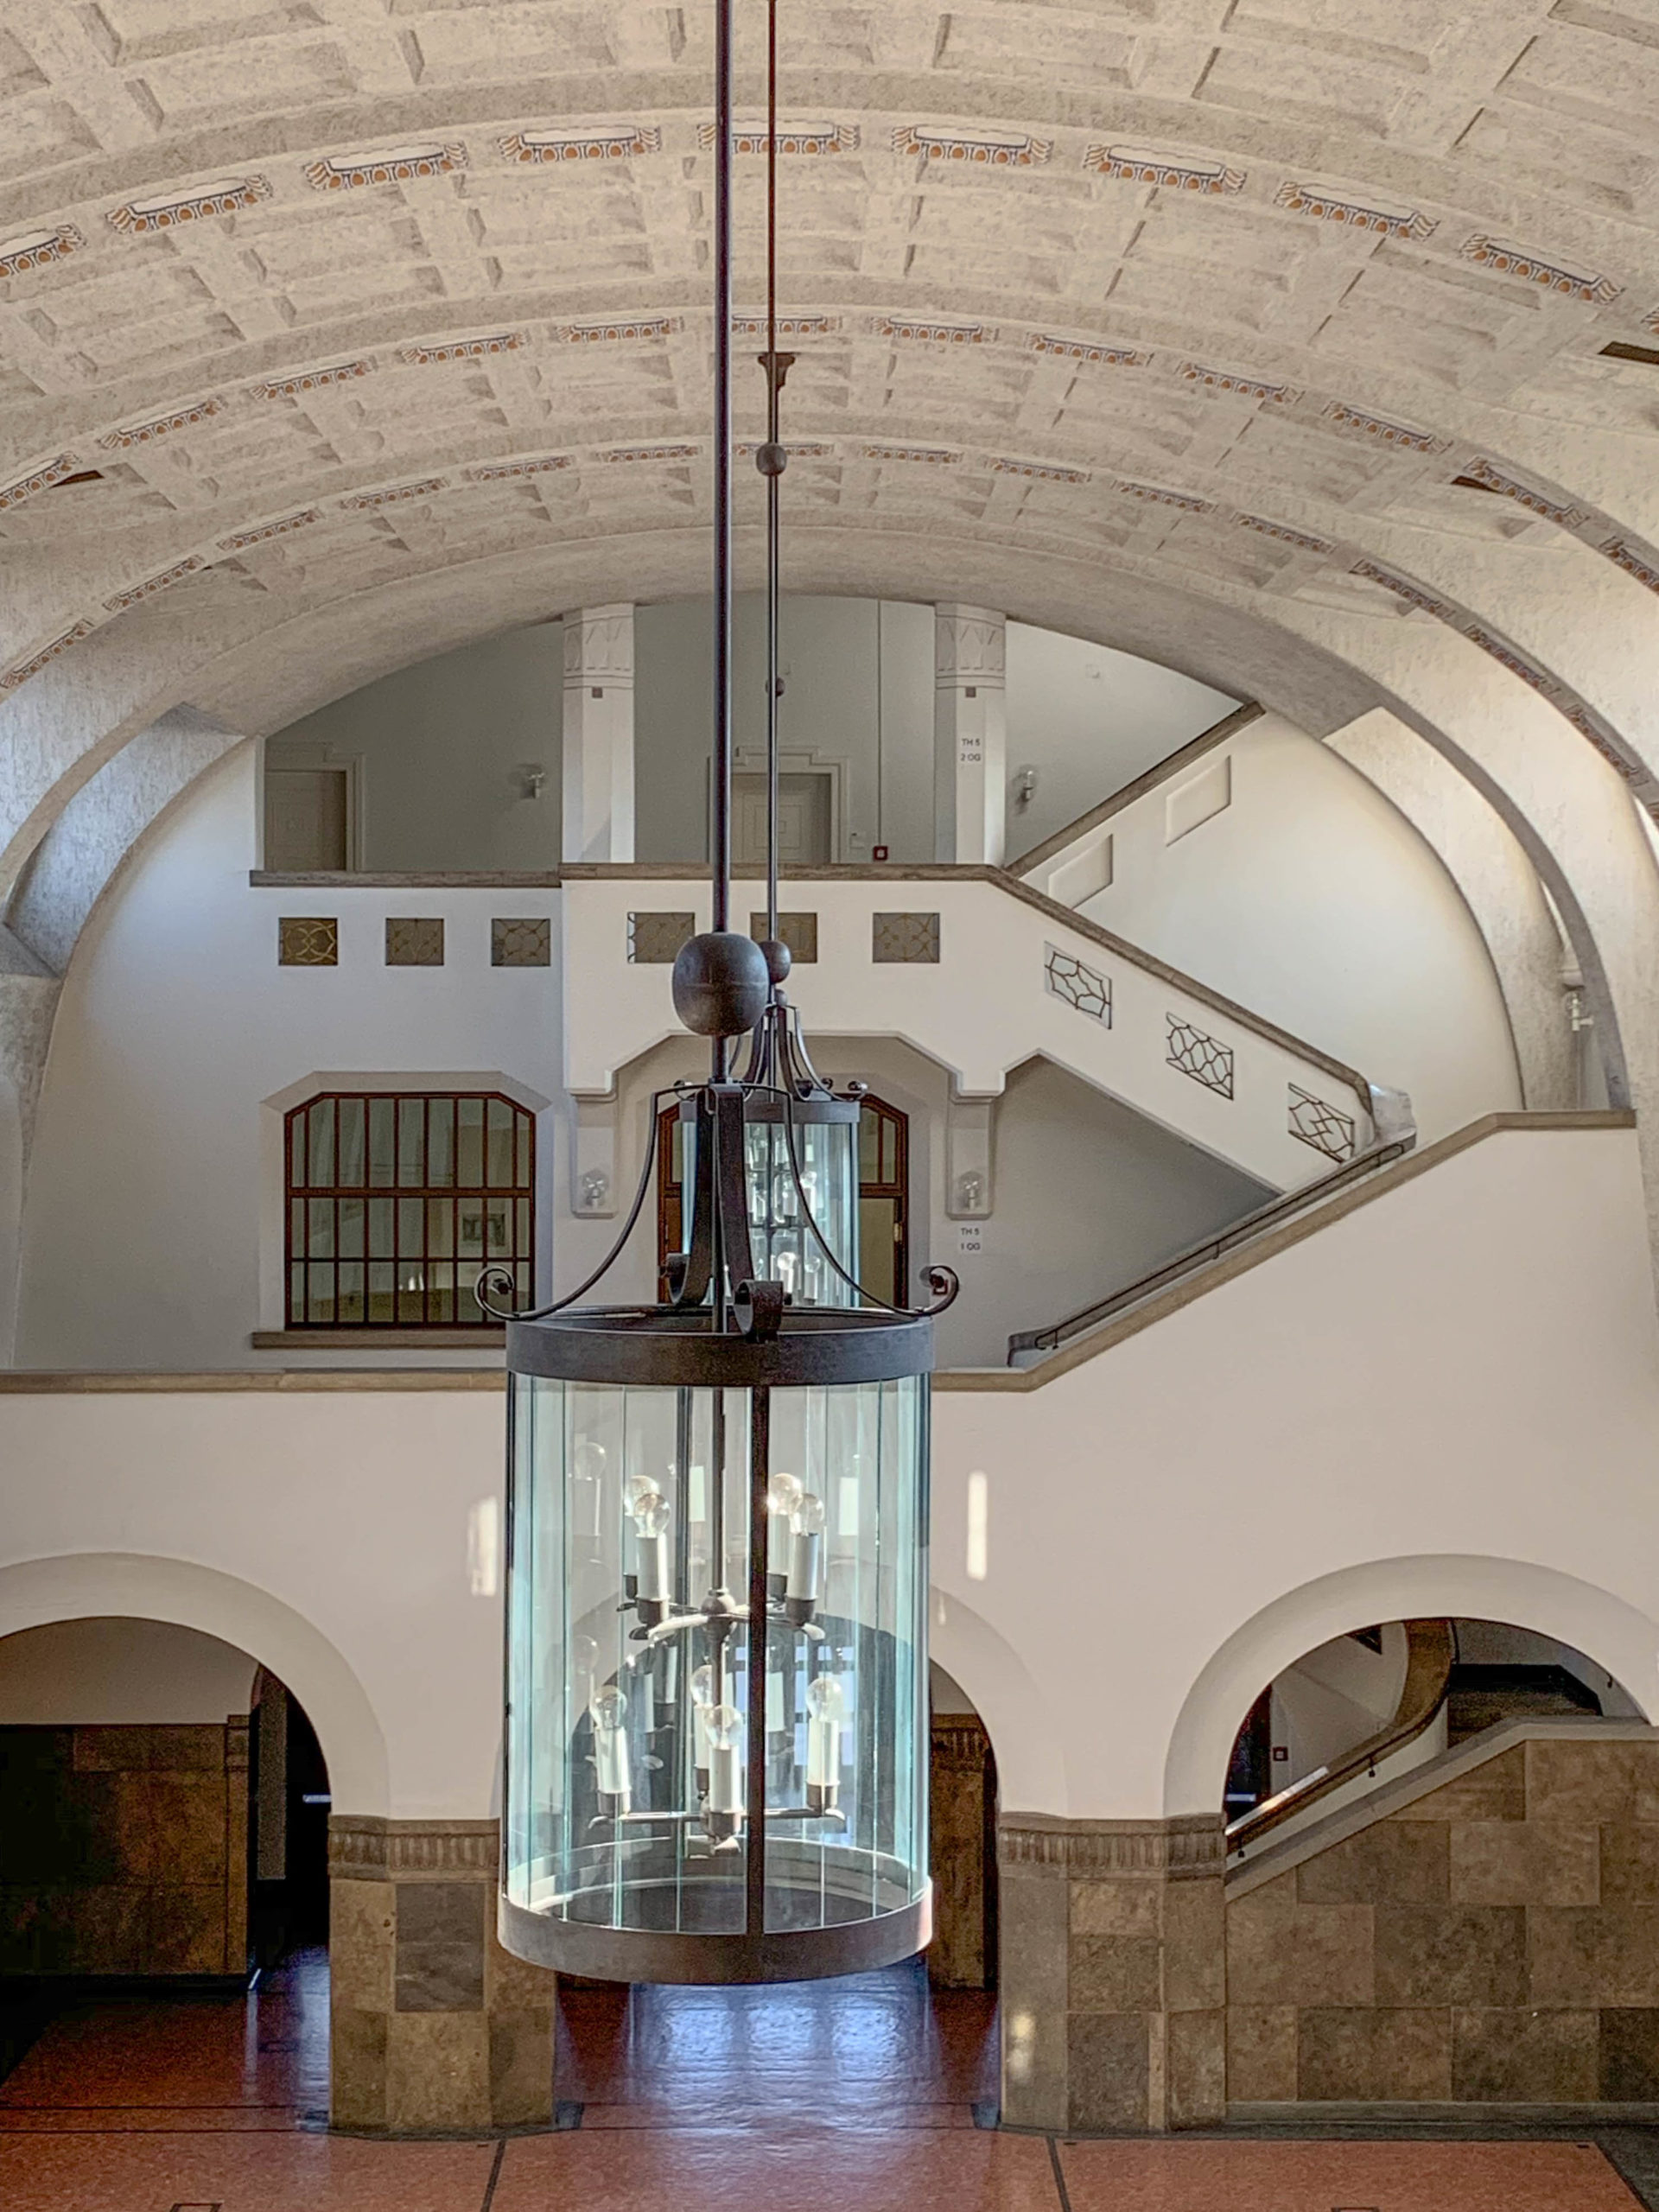 Hauptzollamt, 1912. Architekt: Hugo Kaiser